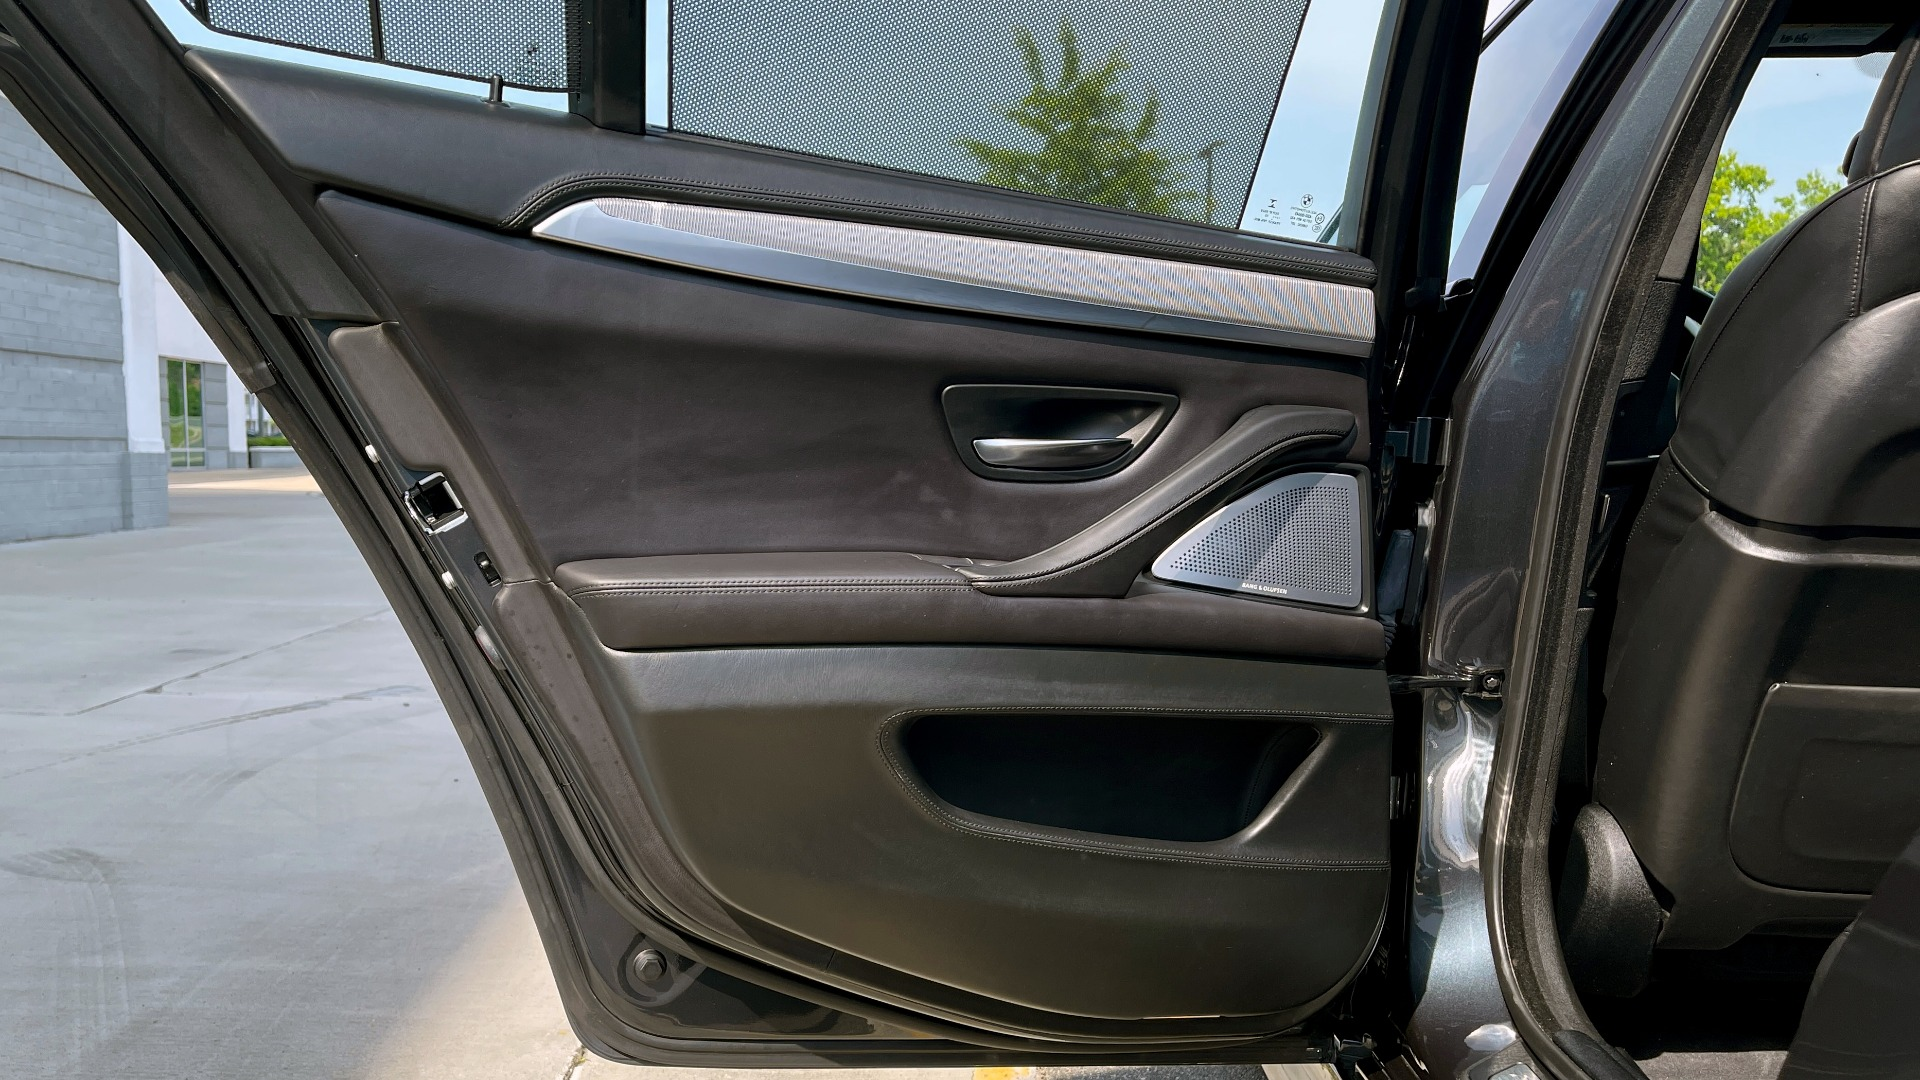 Used 2015 BMW M5 SEDAN / EXEC PKG / HUD / NAV / B&O SND / SUNROOF / REARVIEW for sale Sold at Formula Imports in Charlotte NC 28227 72